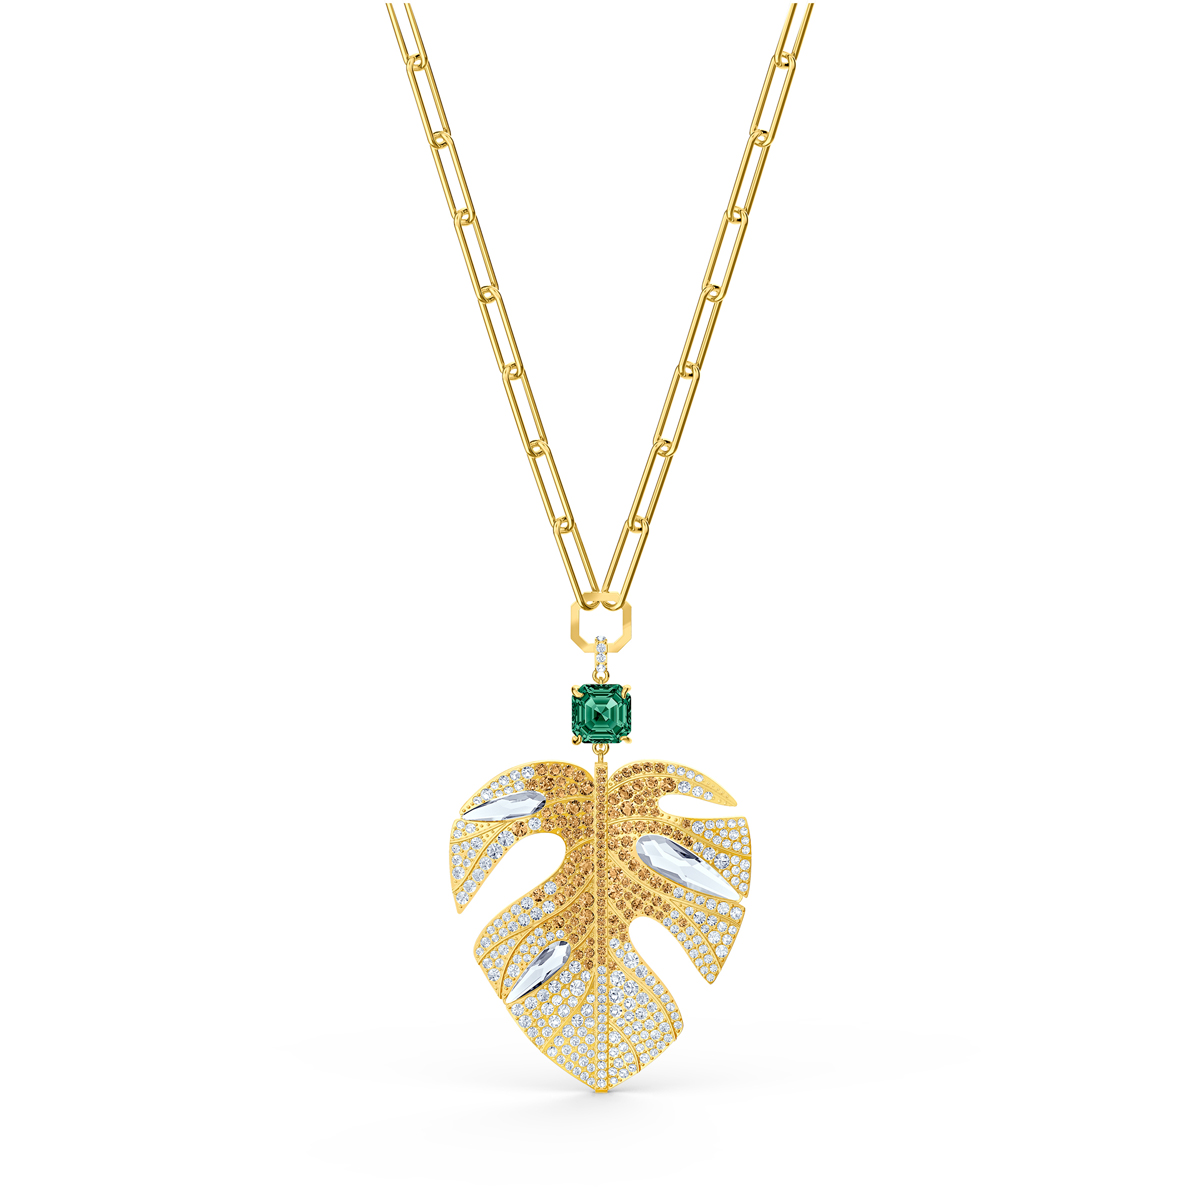 Swarovski Necklace Tropical Pendant Leaf Light Multi Gold